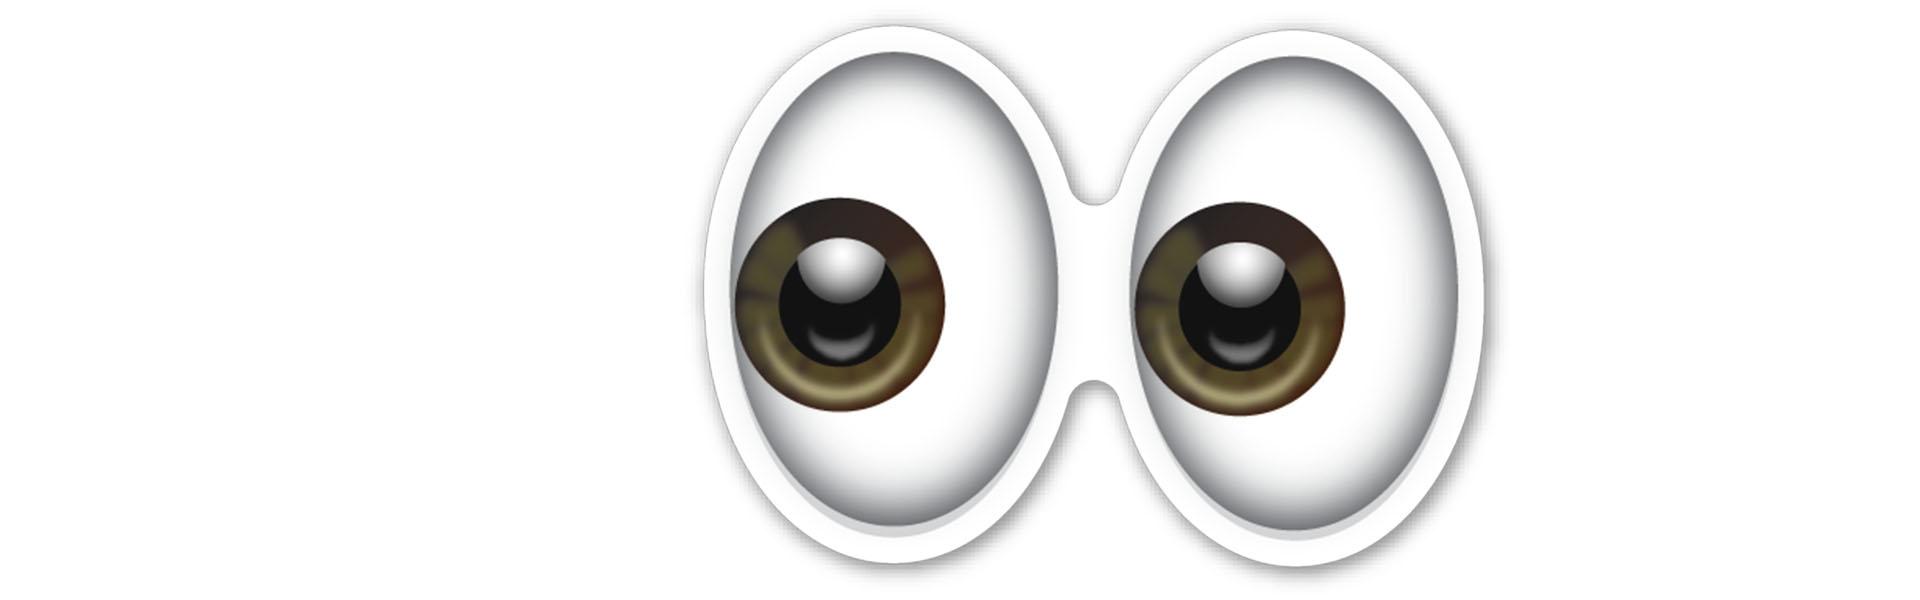 eyes emoji banner